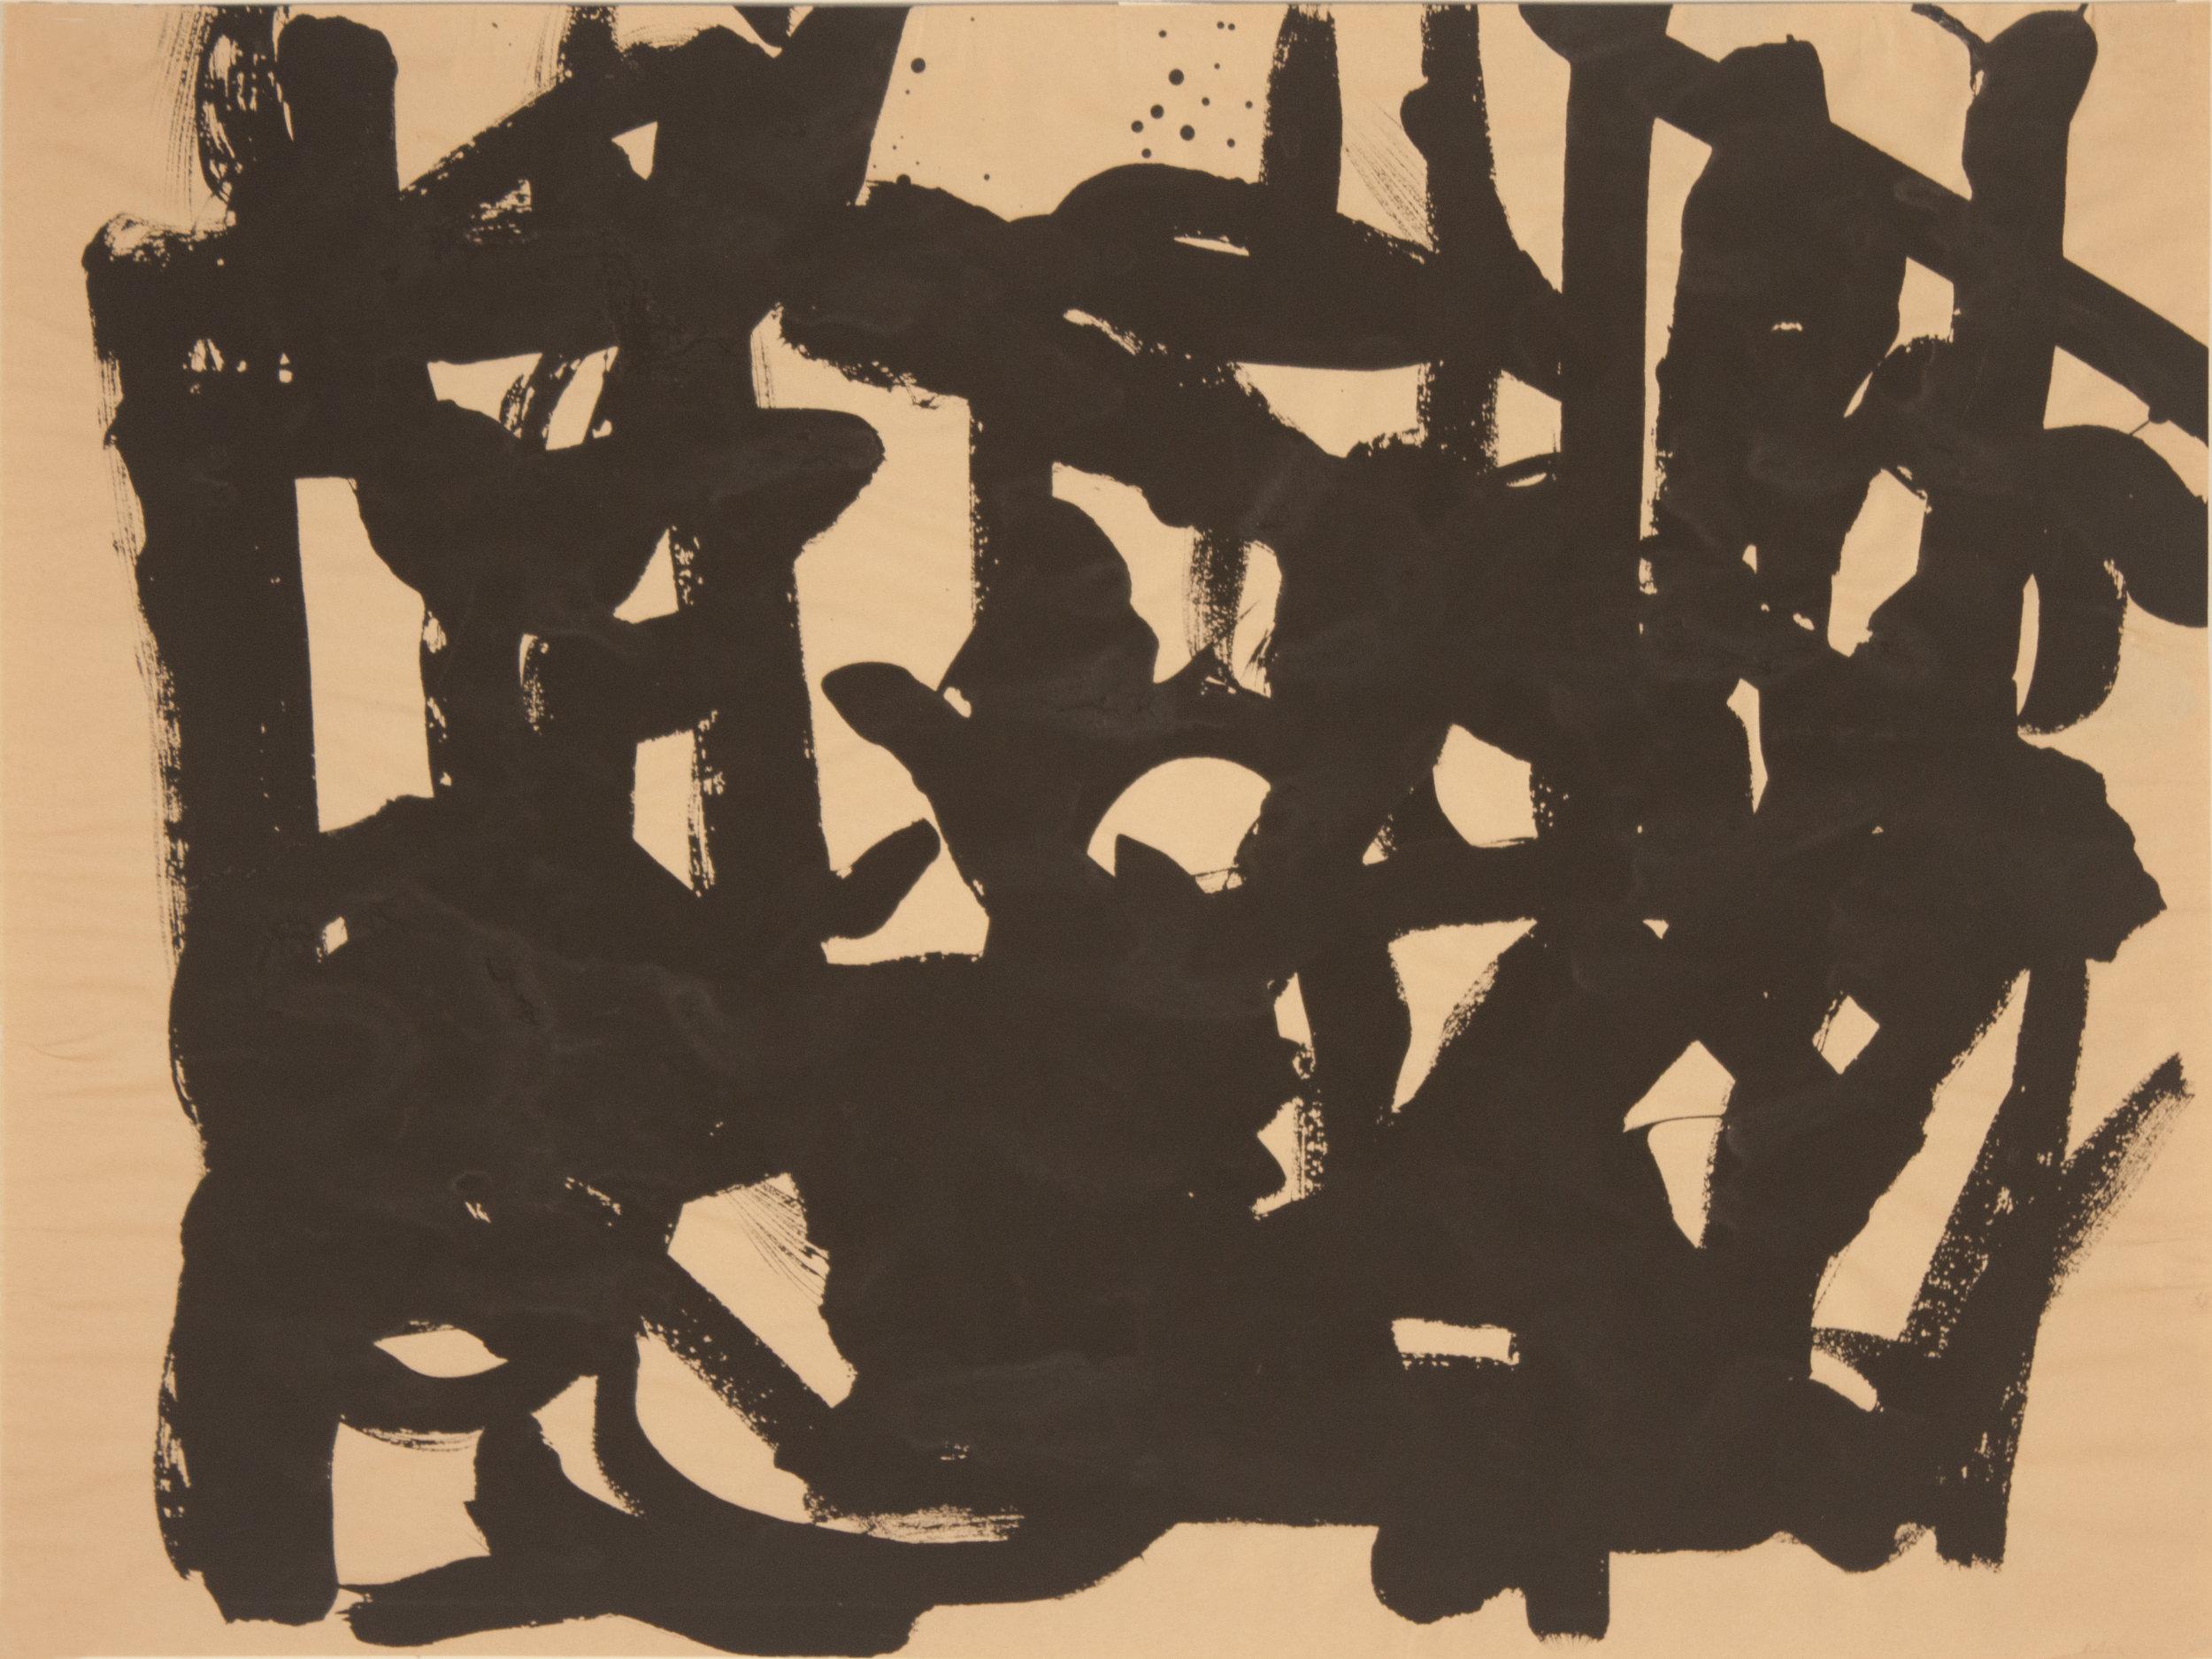 Brush Drawing 6, 1979